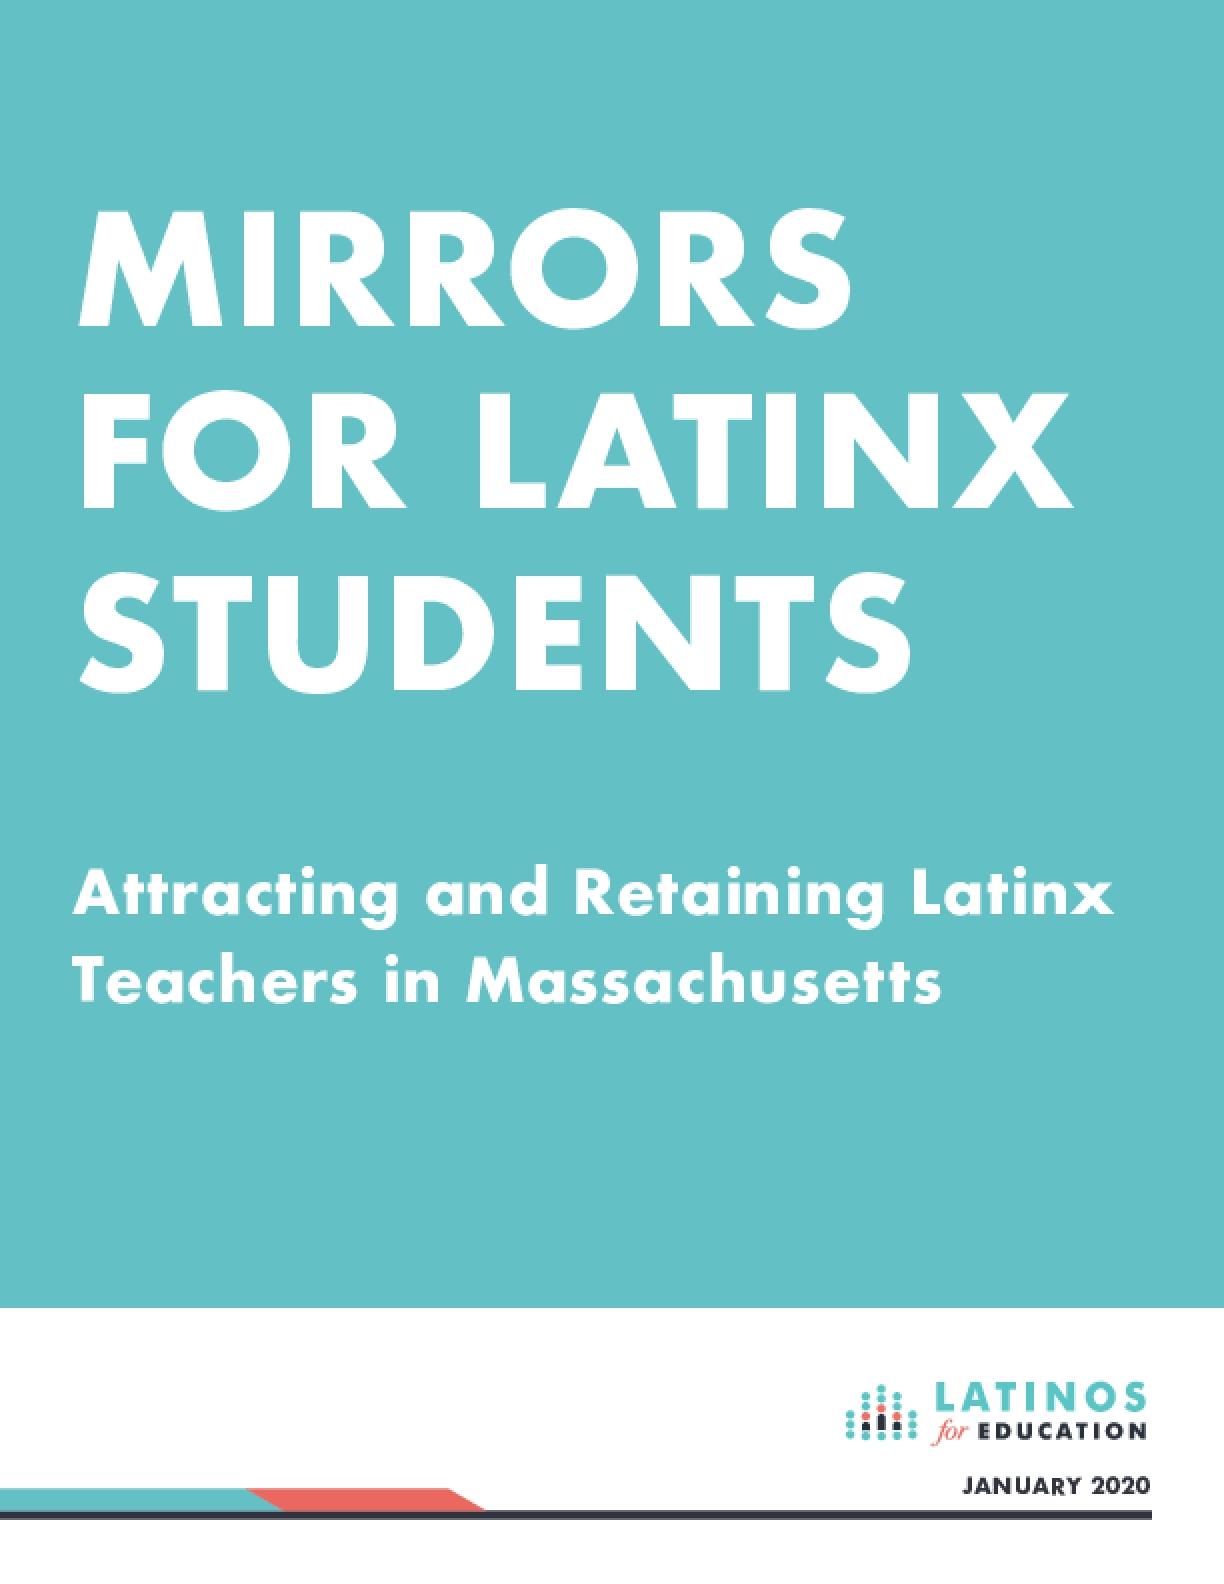 MIRRORS FOR LATINX STUDENTS: Attracting and Retaining Latinx Teachers in Massachusetts